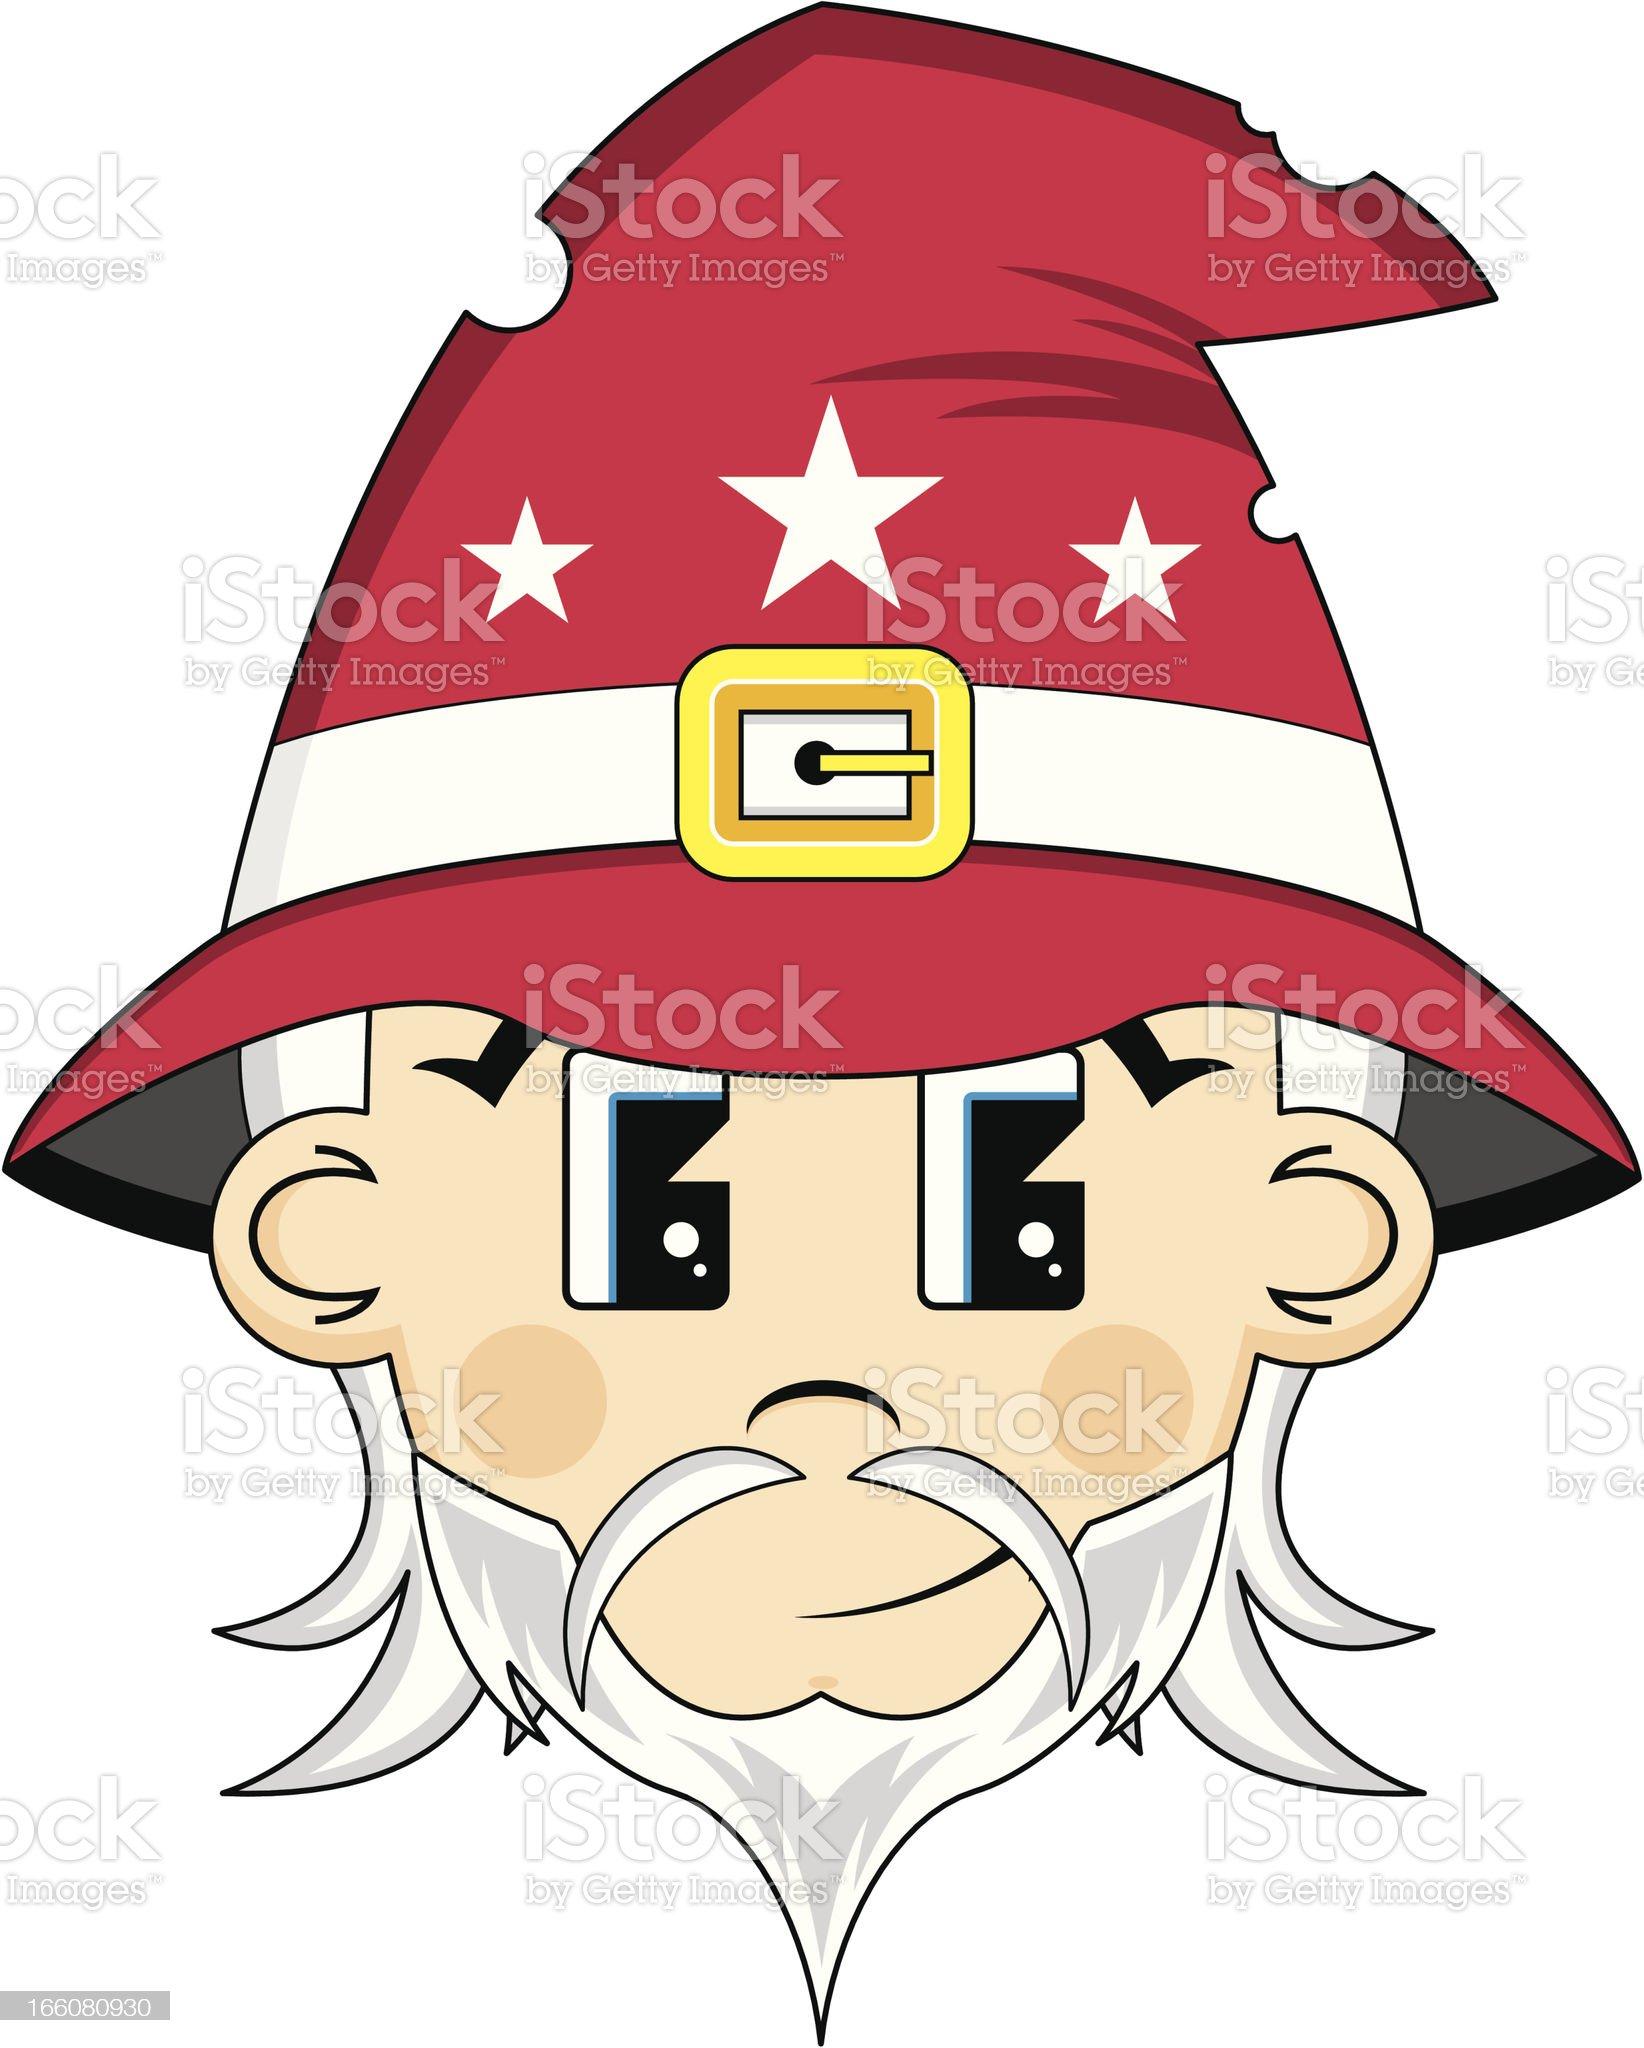 Cute Wizard Head royalty-free stock vector art